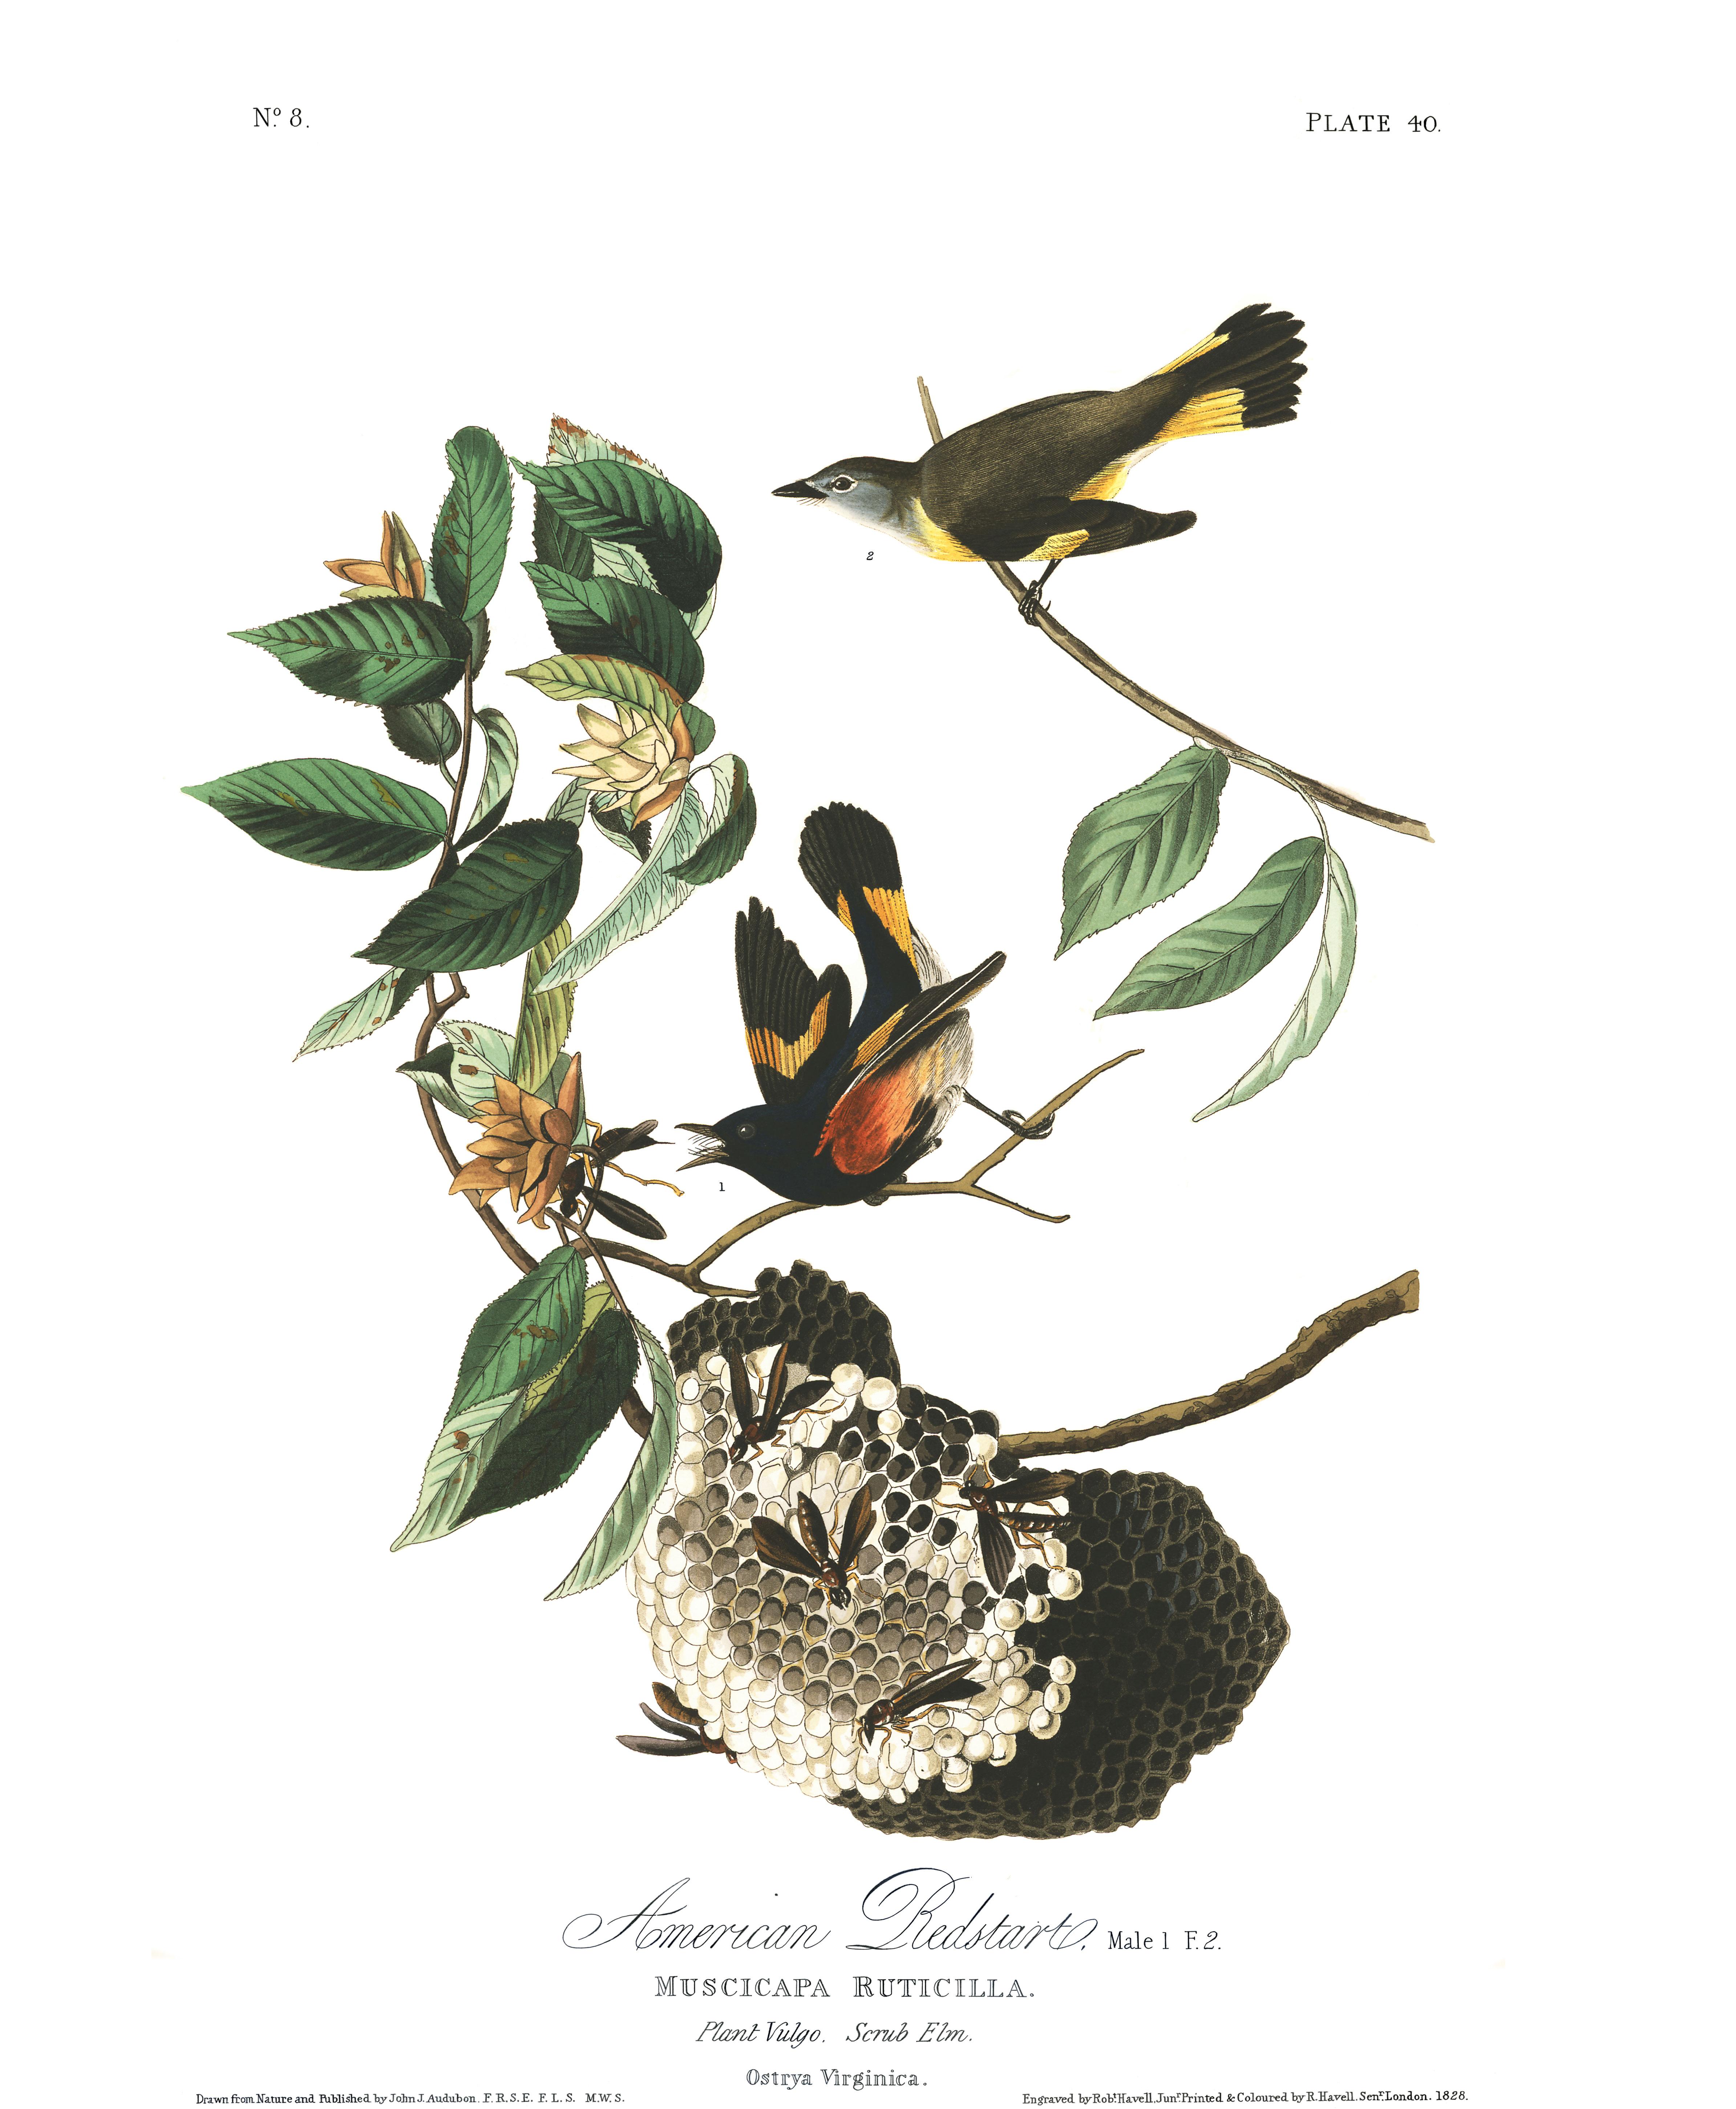 J. J. Audubon – Plate 40 – American Redstart